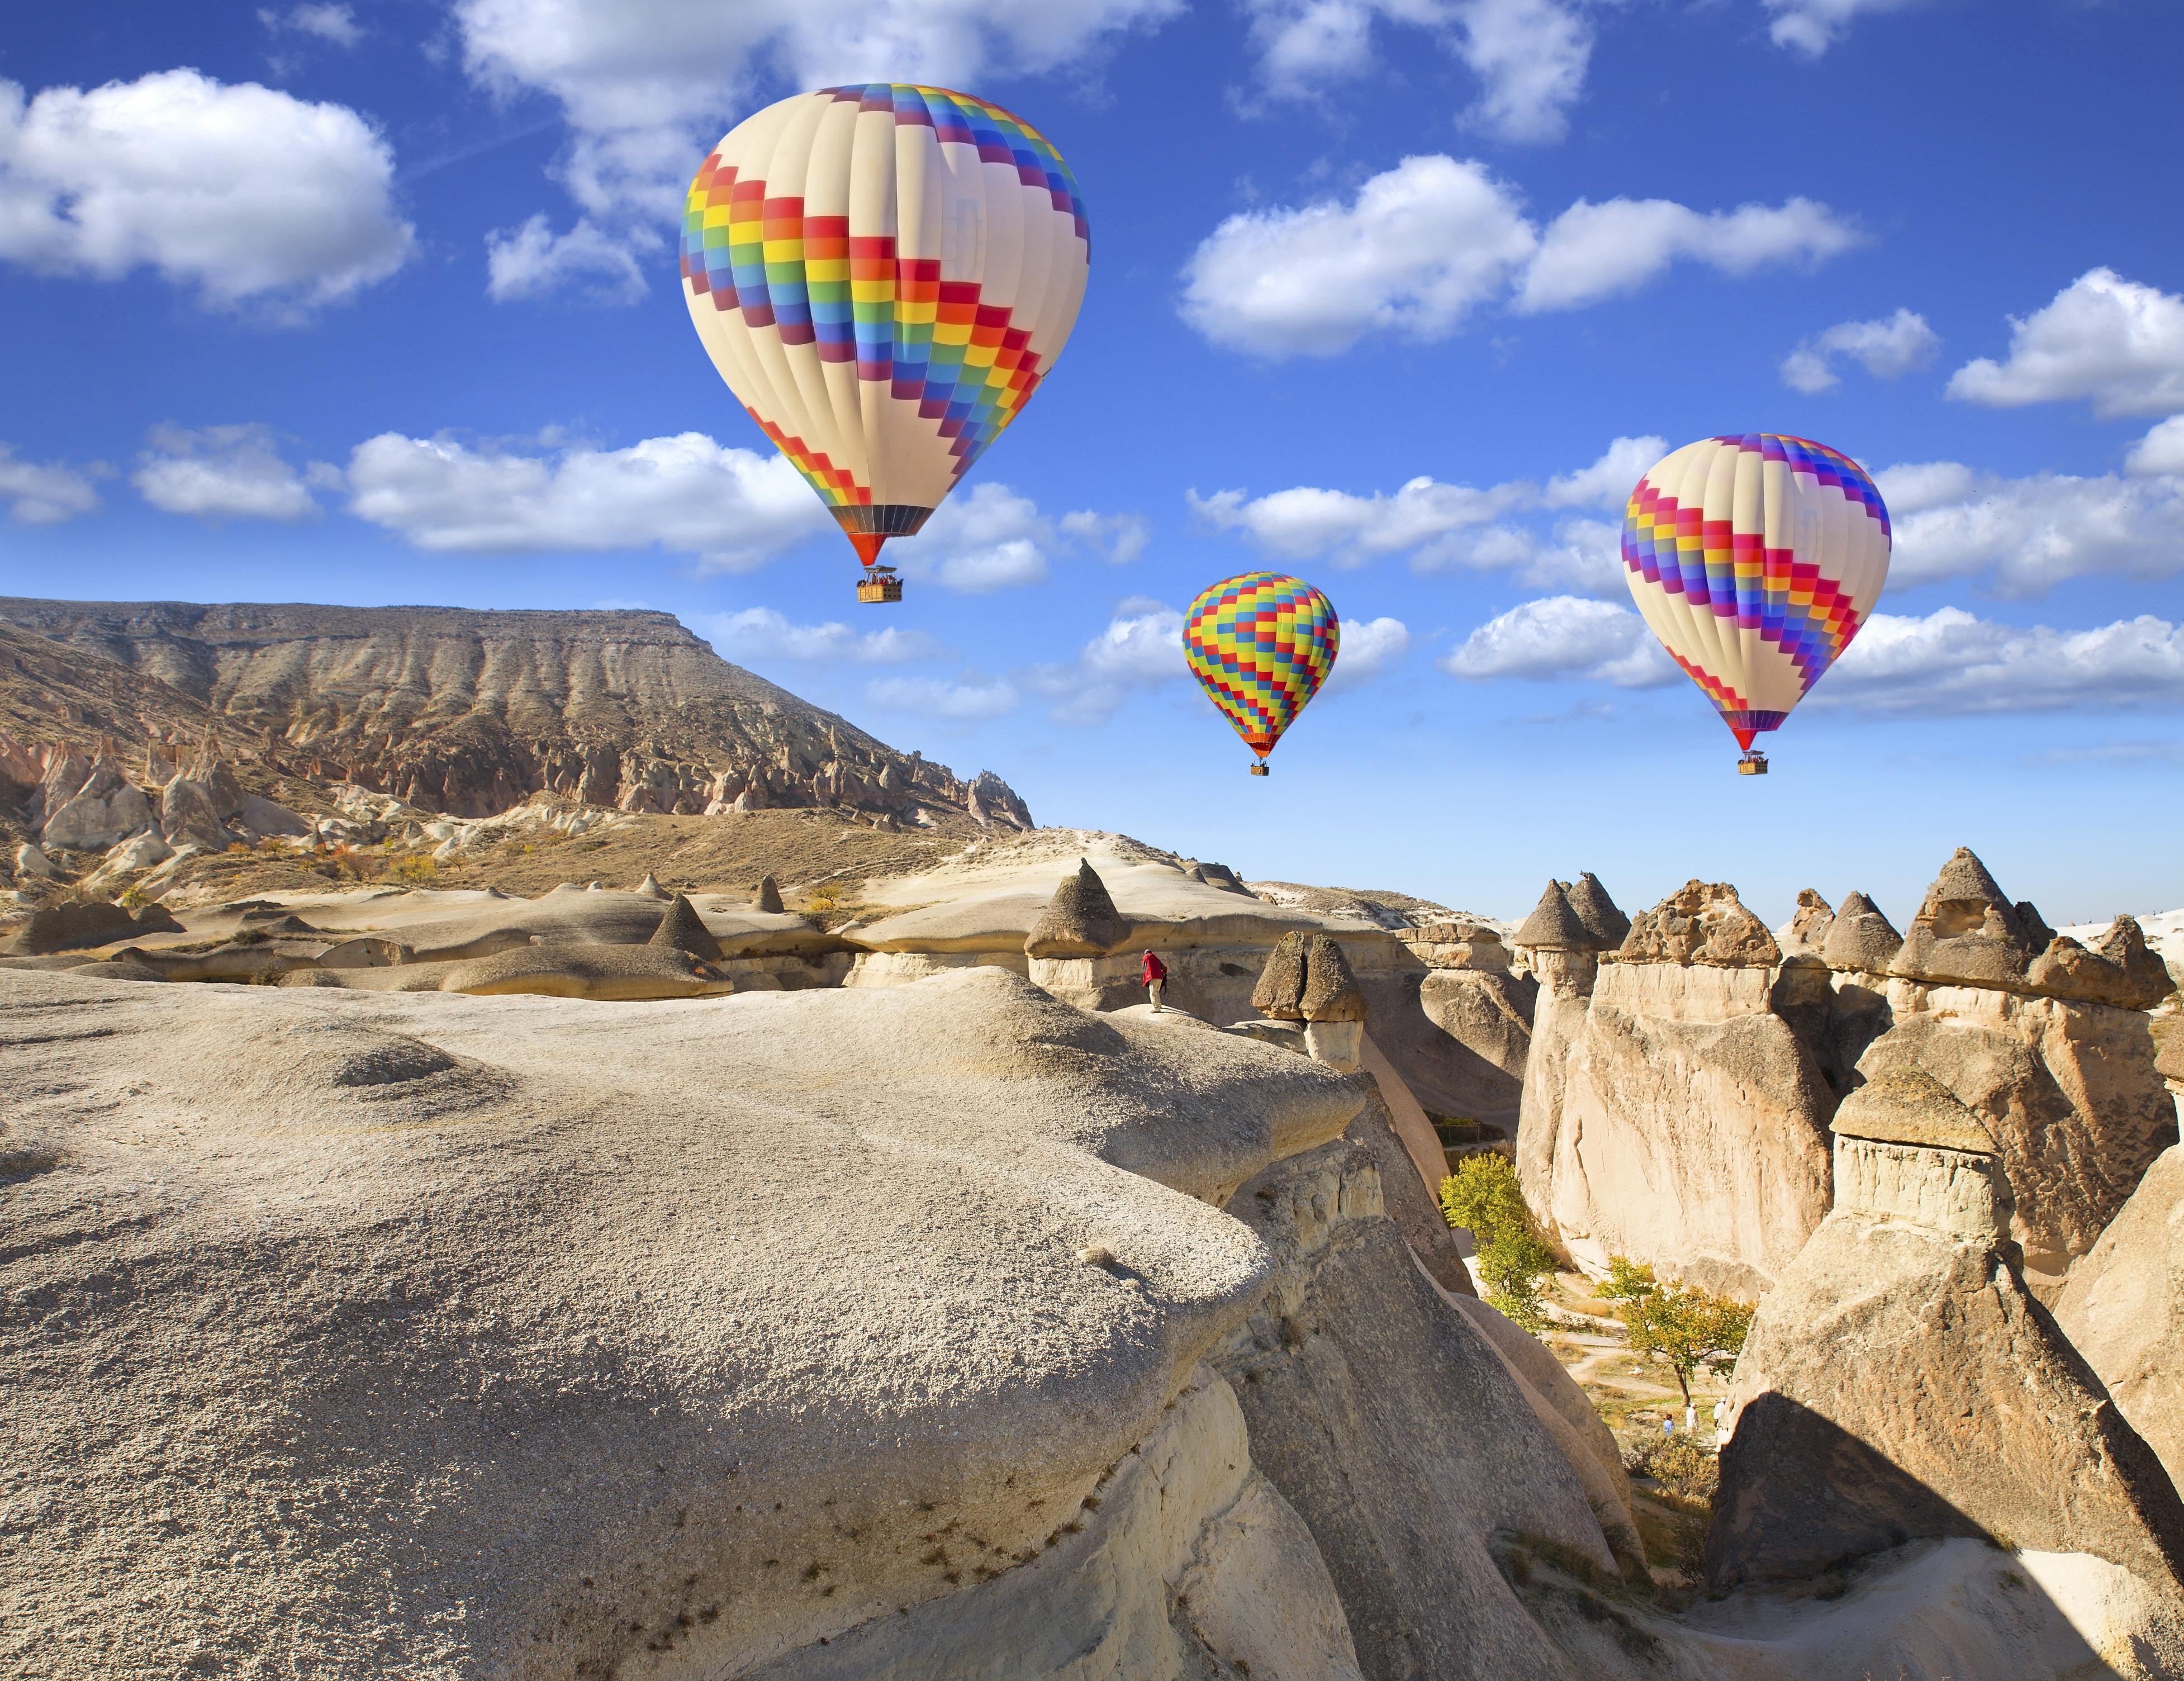 Luchtballonnen in Cappadocië, Turkije